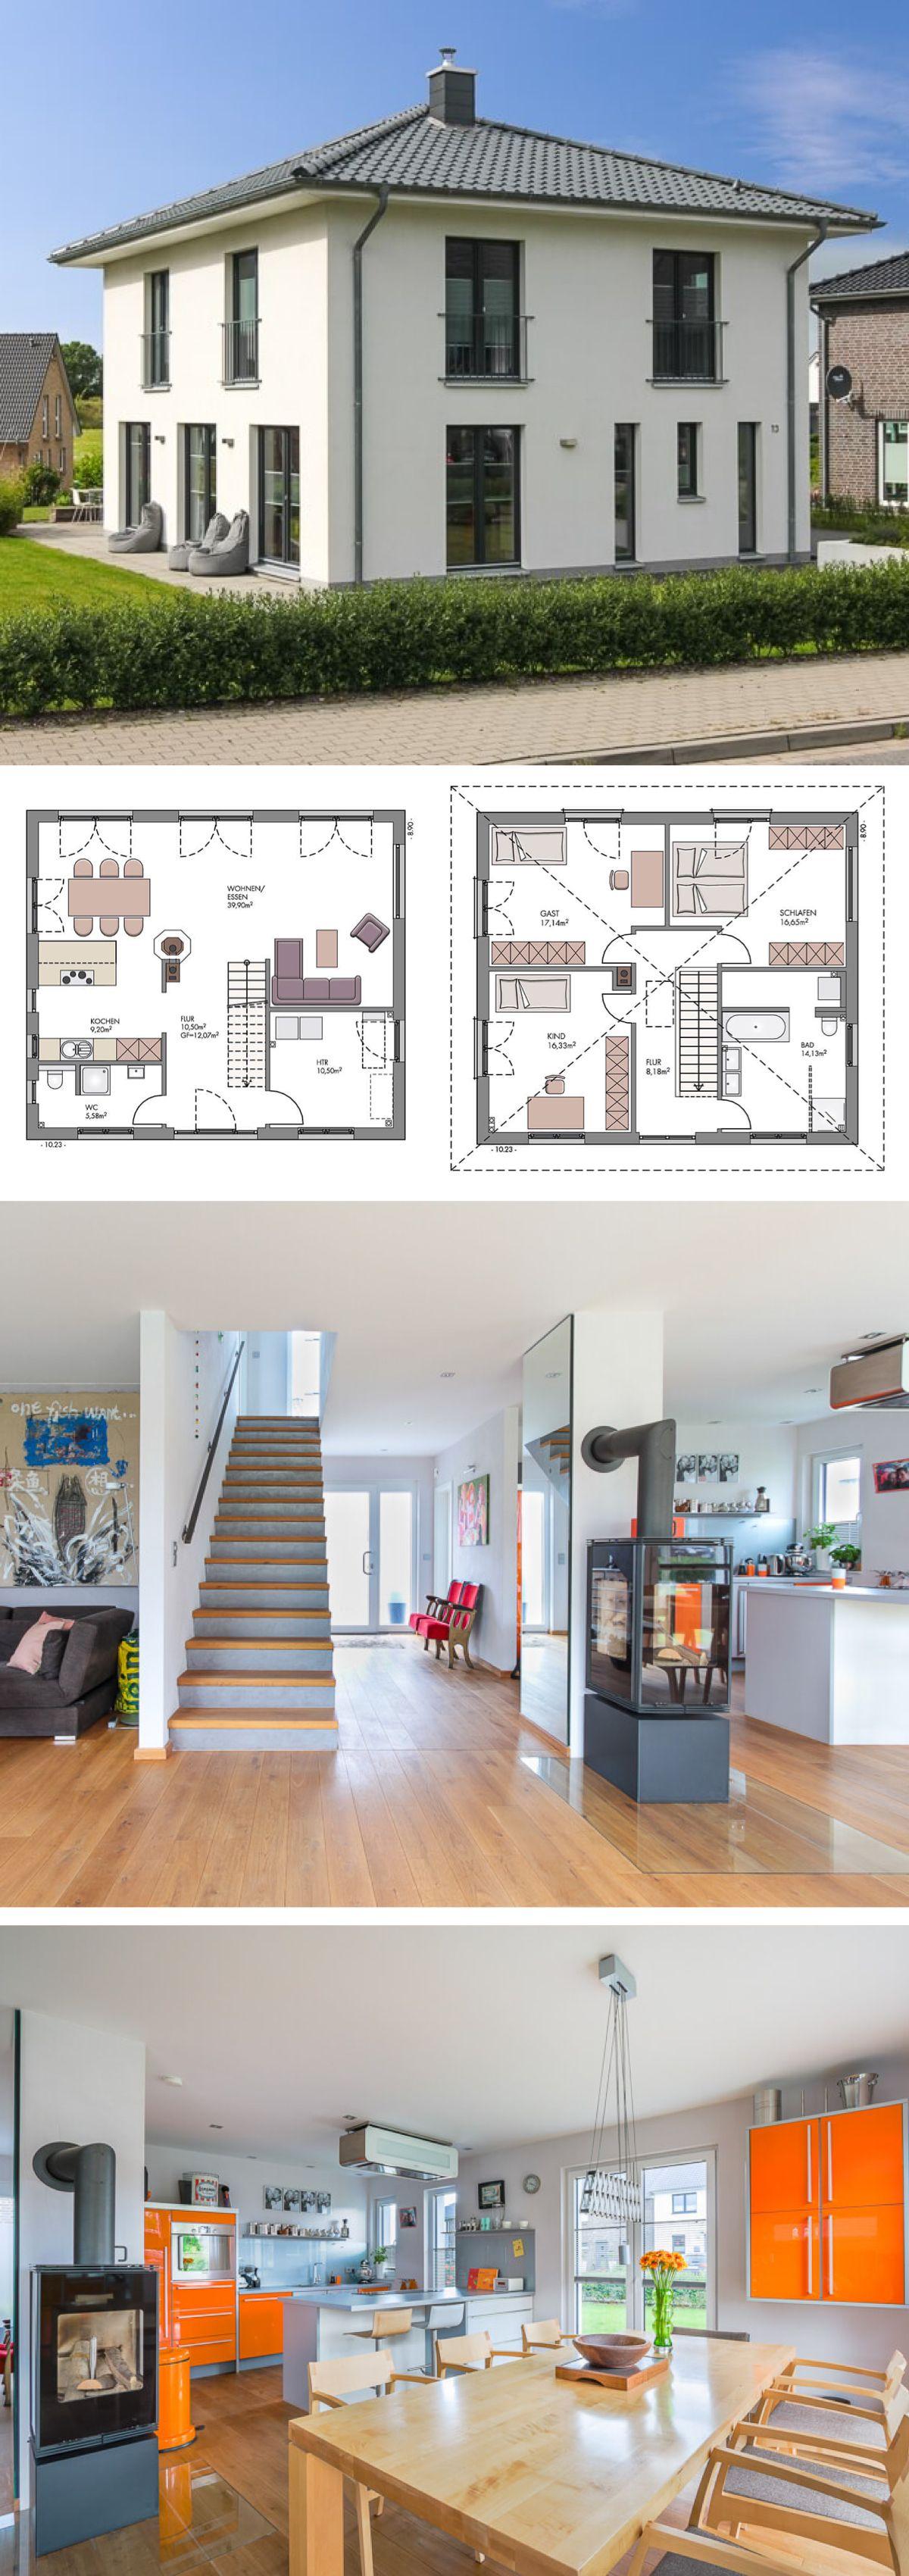 Stadtvilla modern mit Bauhaus-Elementen, Kamin & Zeltdach ...